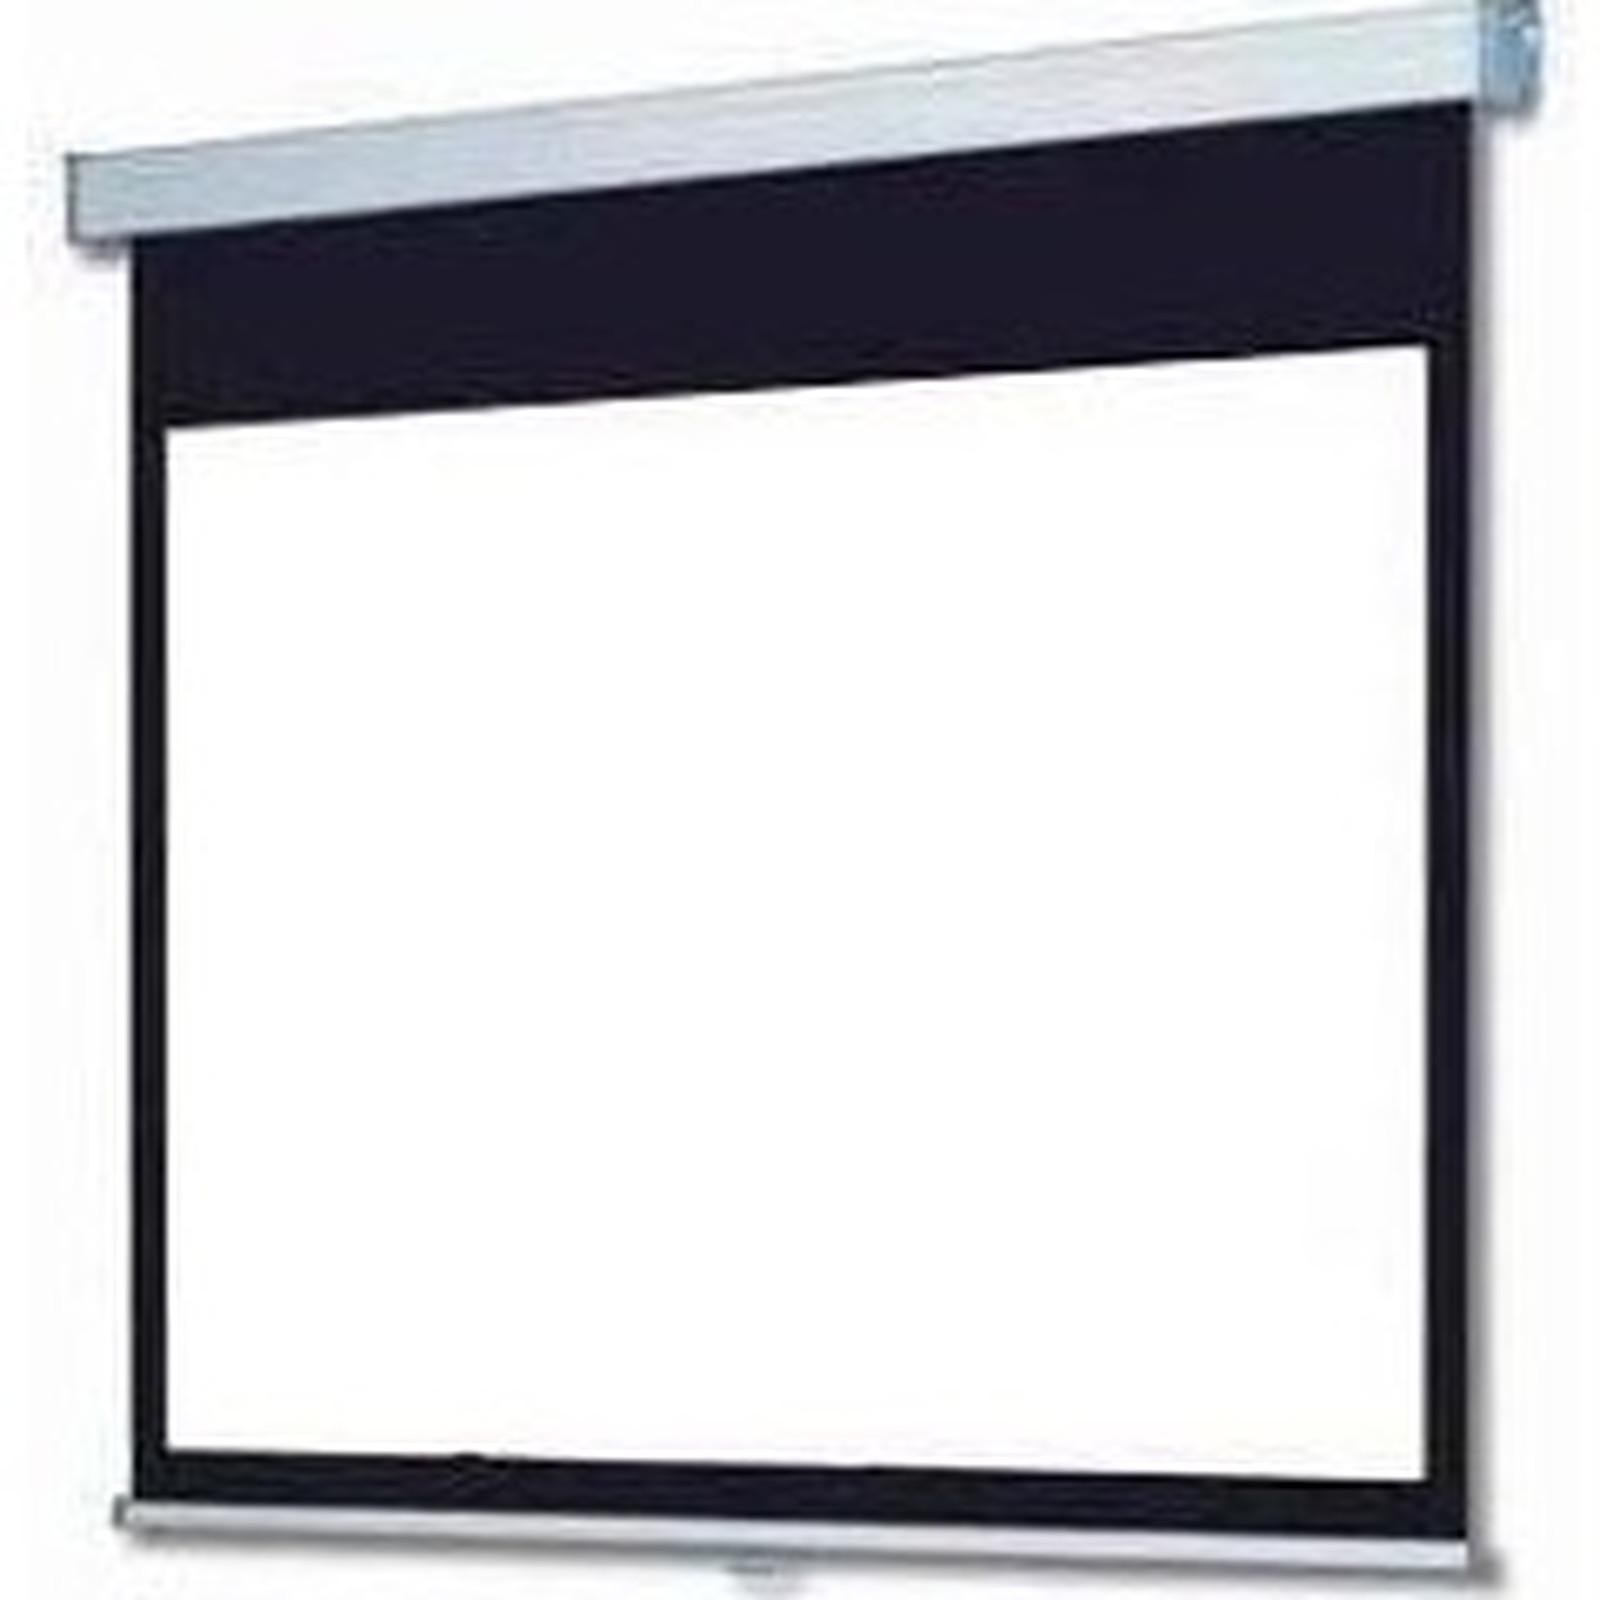 INOVU PMV20   Projector screen INOVU on LDLC